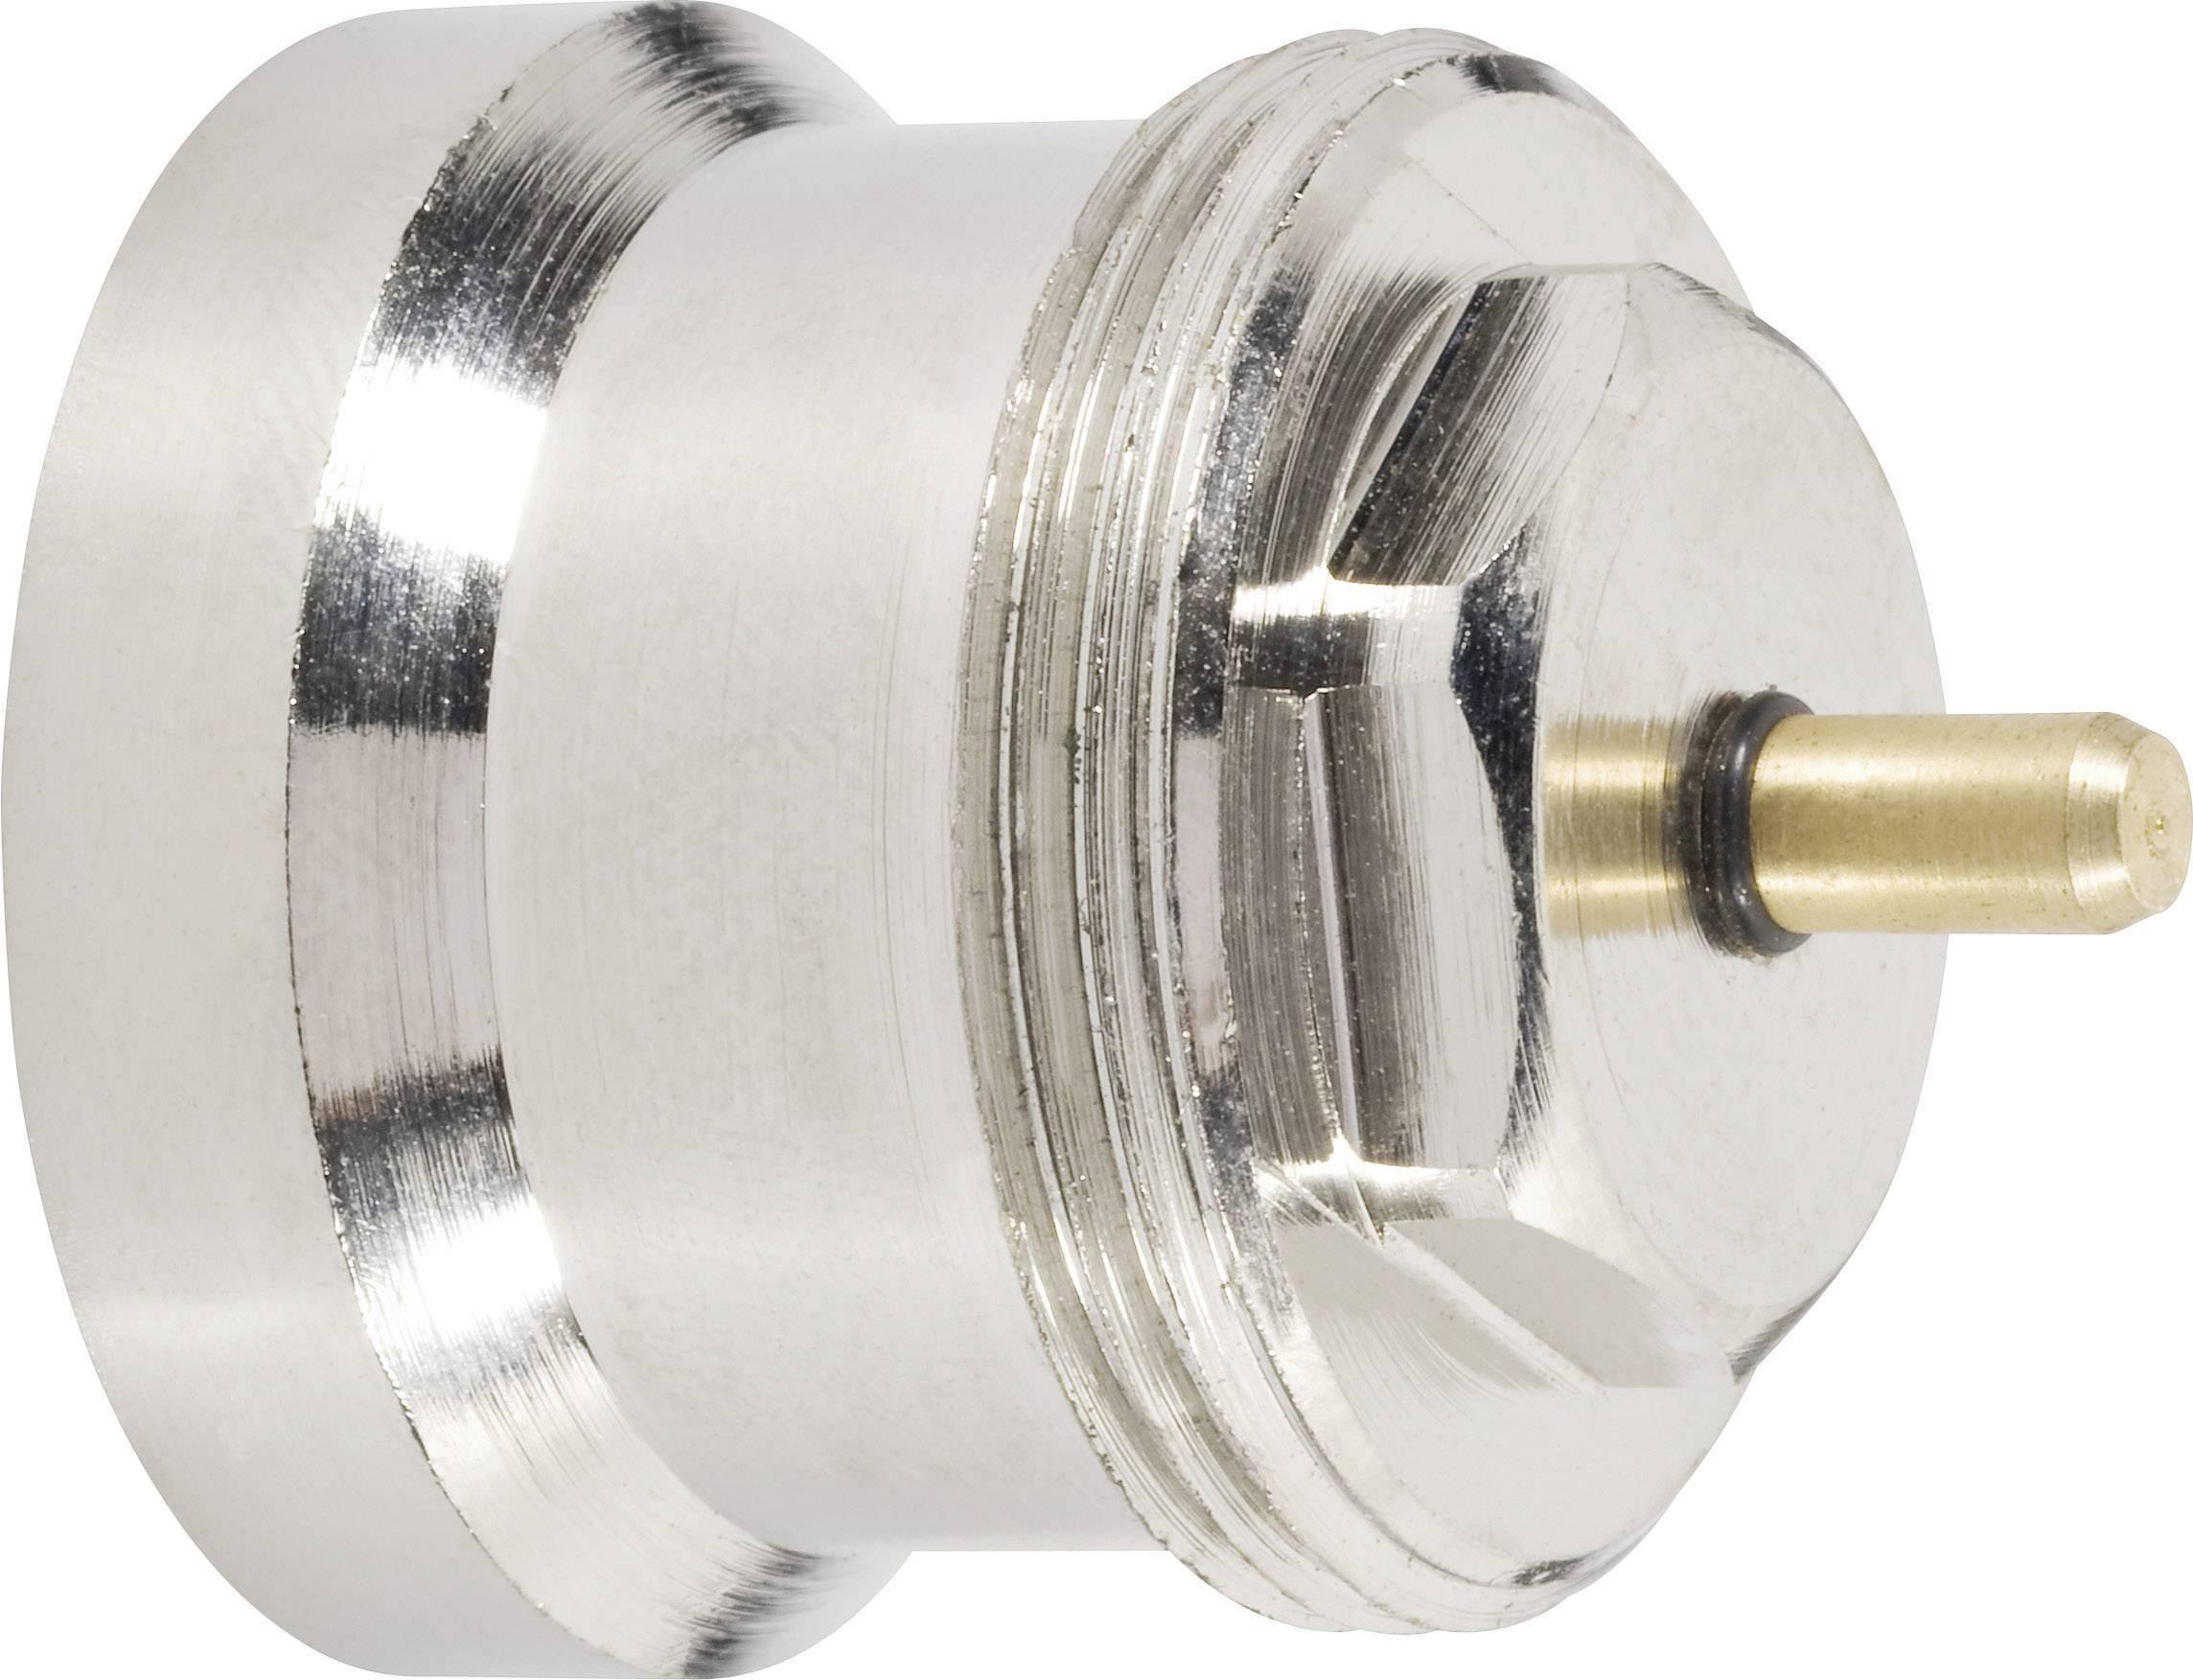 Mosadzný adaptér na ventil radiátora 700 100 002 vhodný pre Oventrop, M30 x 1.0